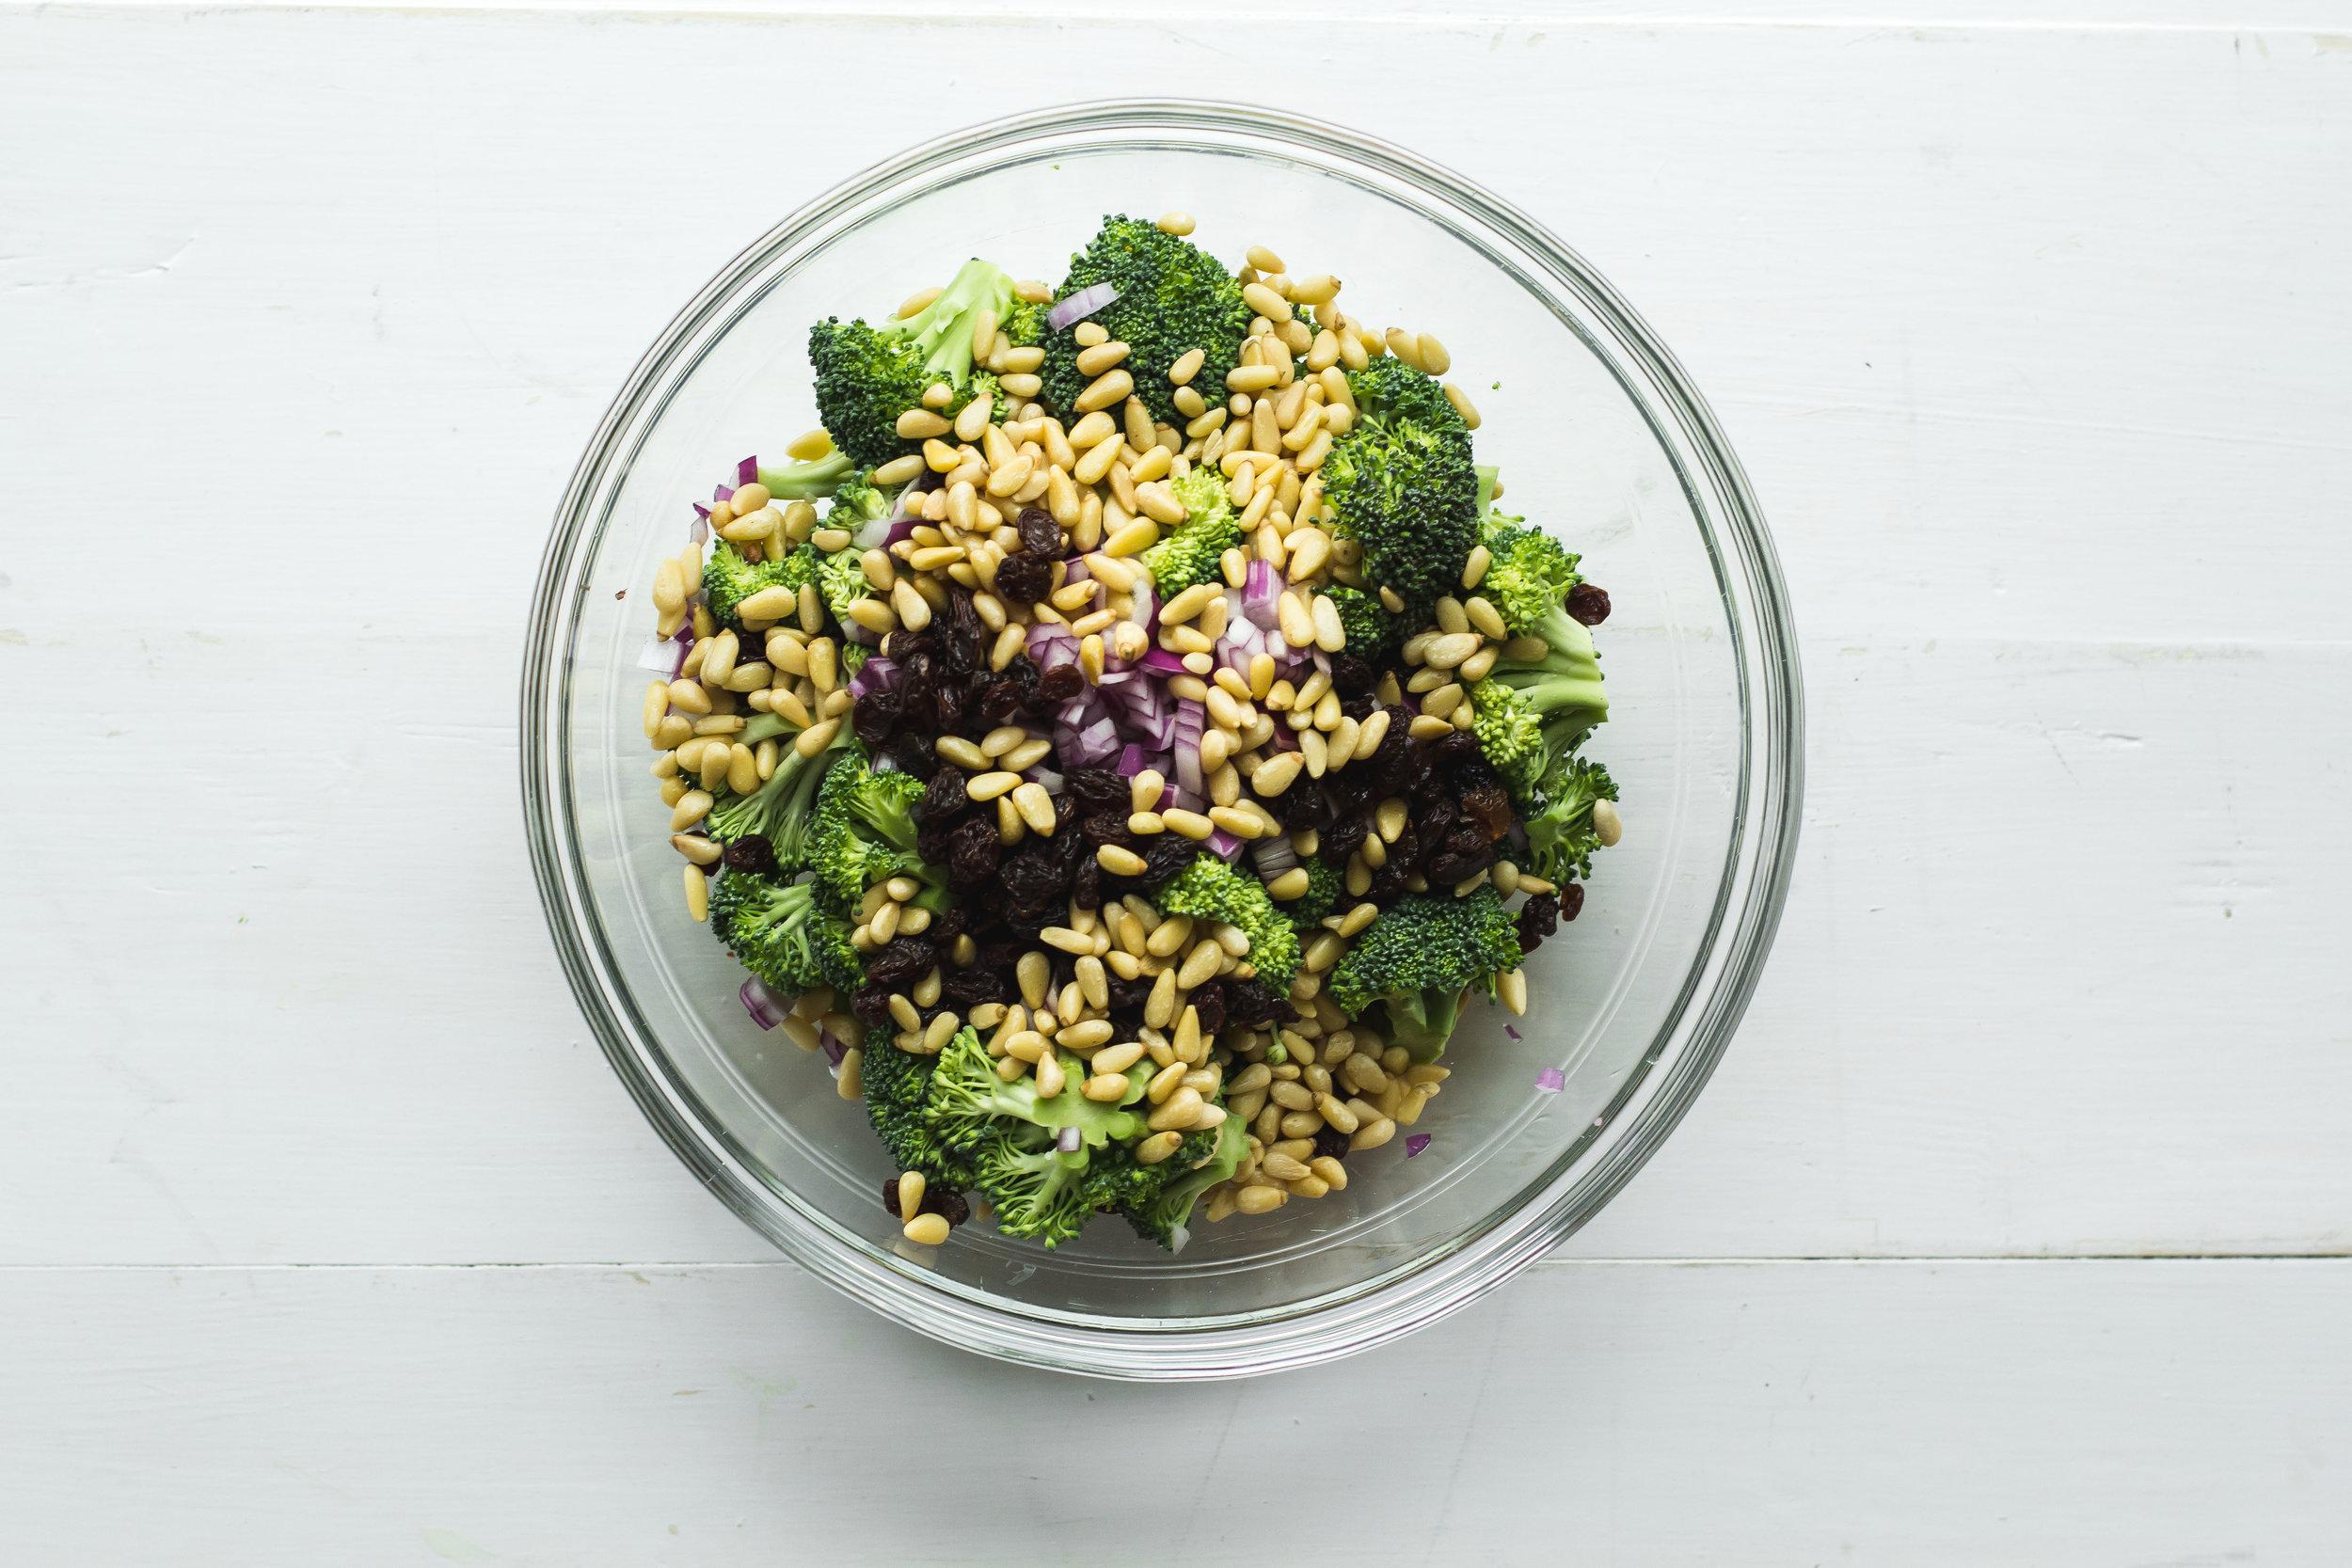 Paleo Summer Broccoli Salad | Sarah J. Hauser #dairyfree #glutenfree #summersalad #potluckrecipe #cookout #picnic